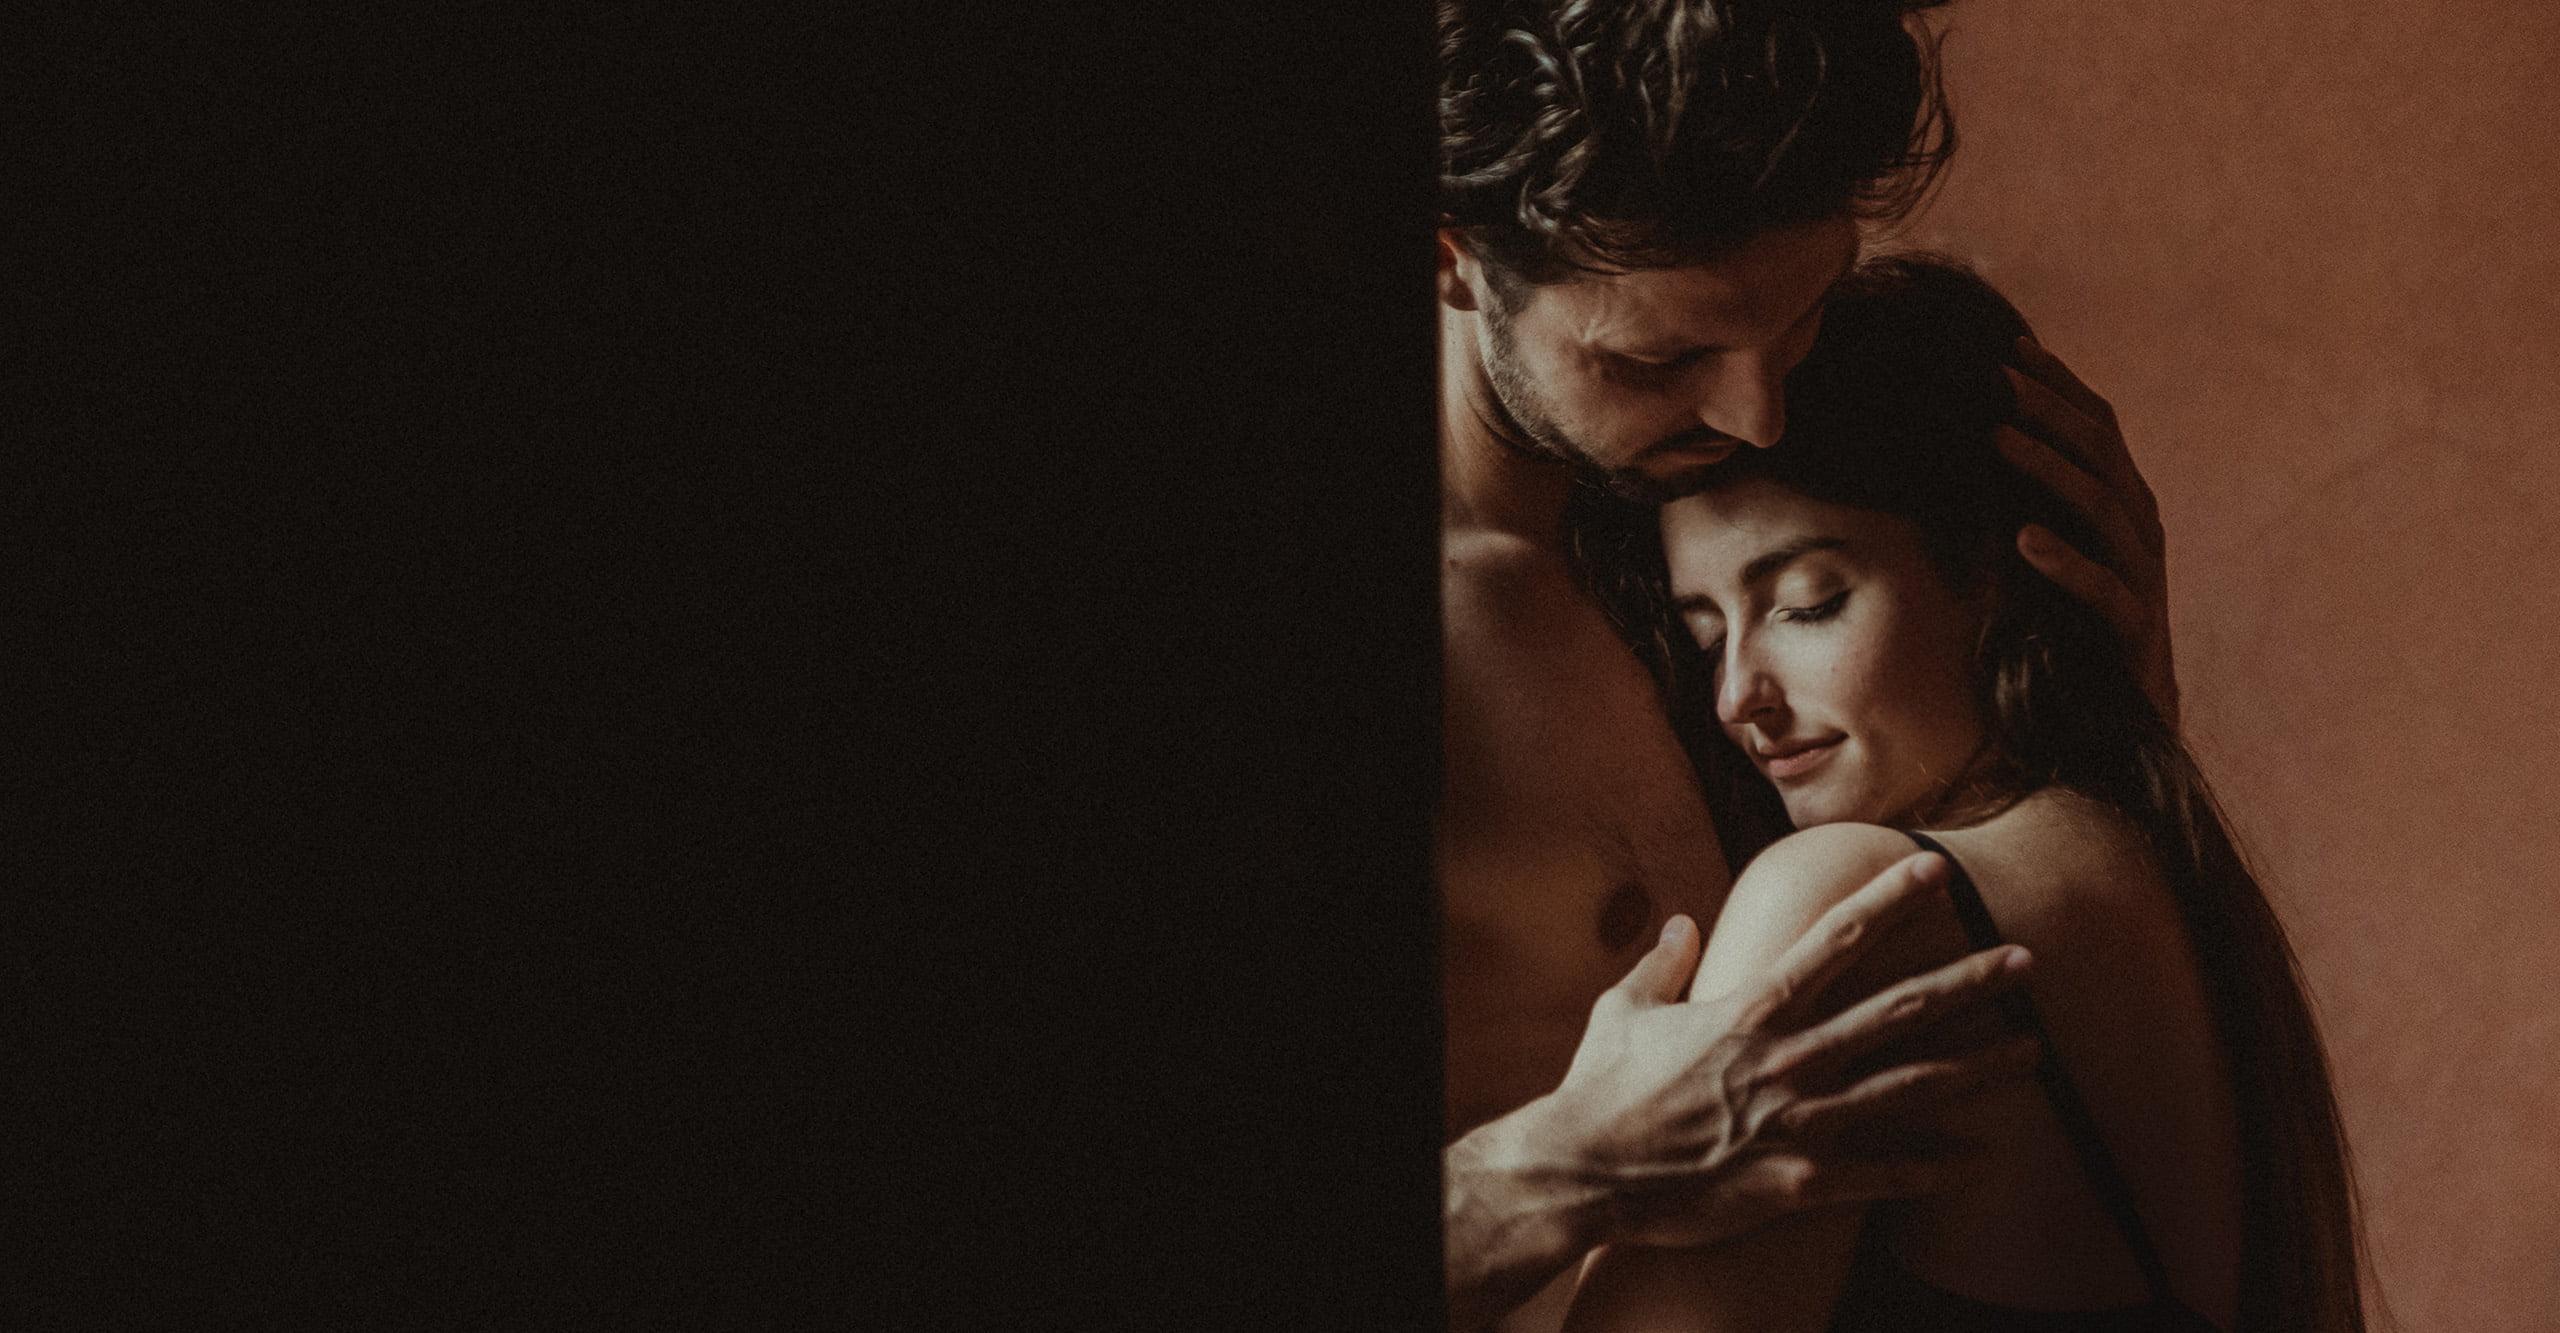 Morroco Elopement filmed by wedding filmmaker Kostas Petsas